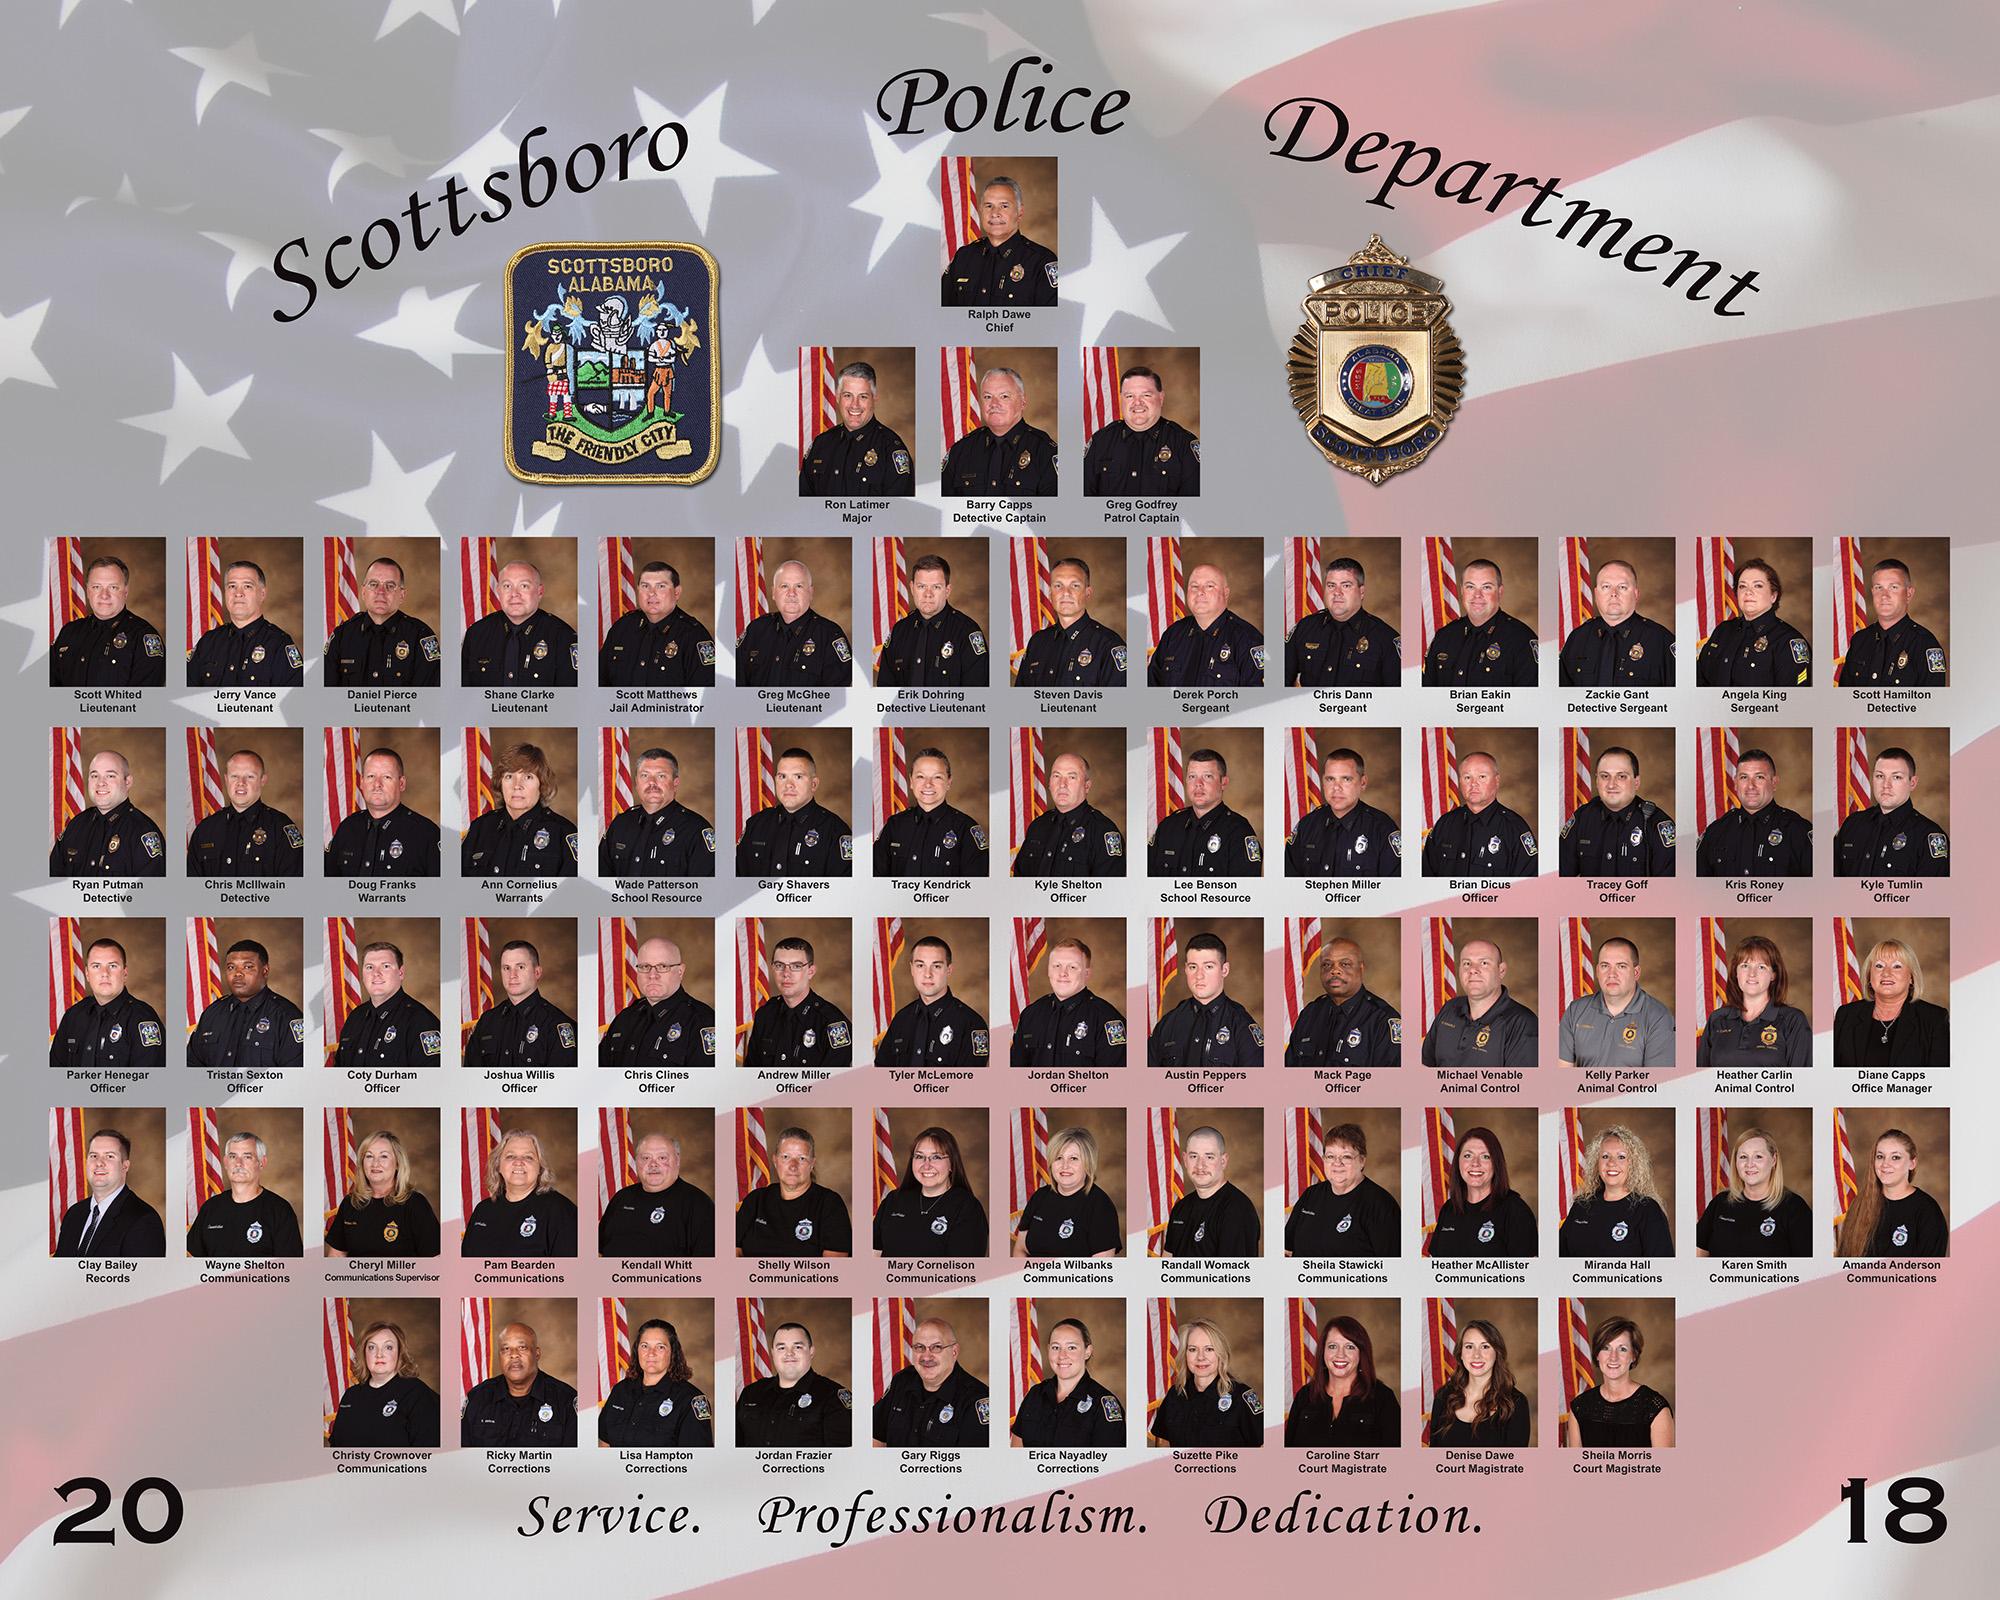 Divisions - Scottsboro Police DepartmentScottsboro Police